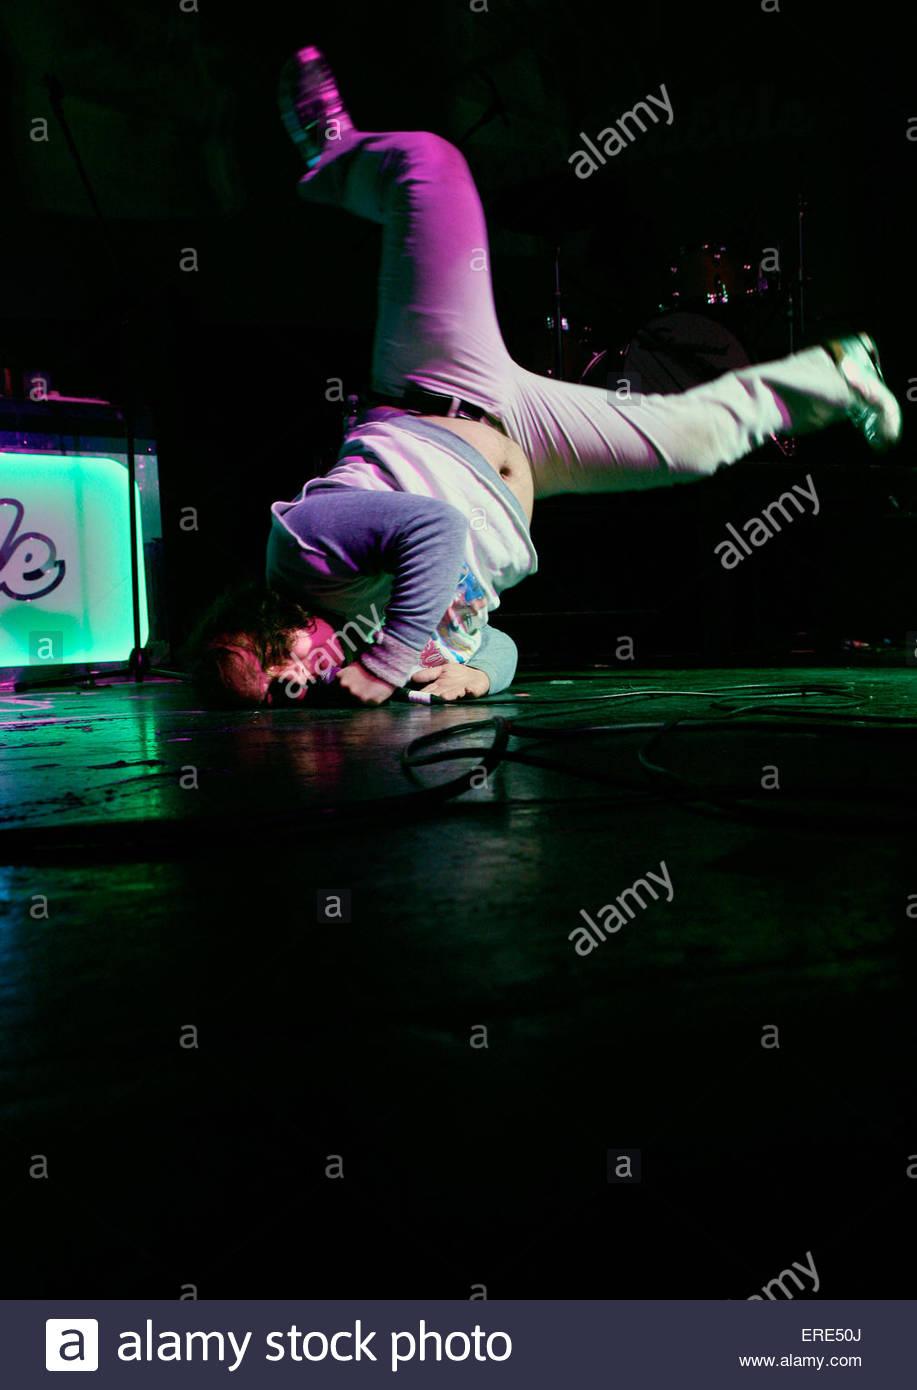 Har Marr Superstar performing in Bristol 18 April 2008 - Stock Image